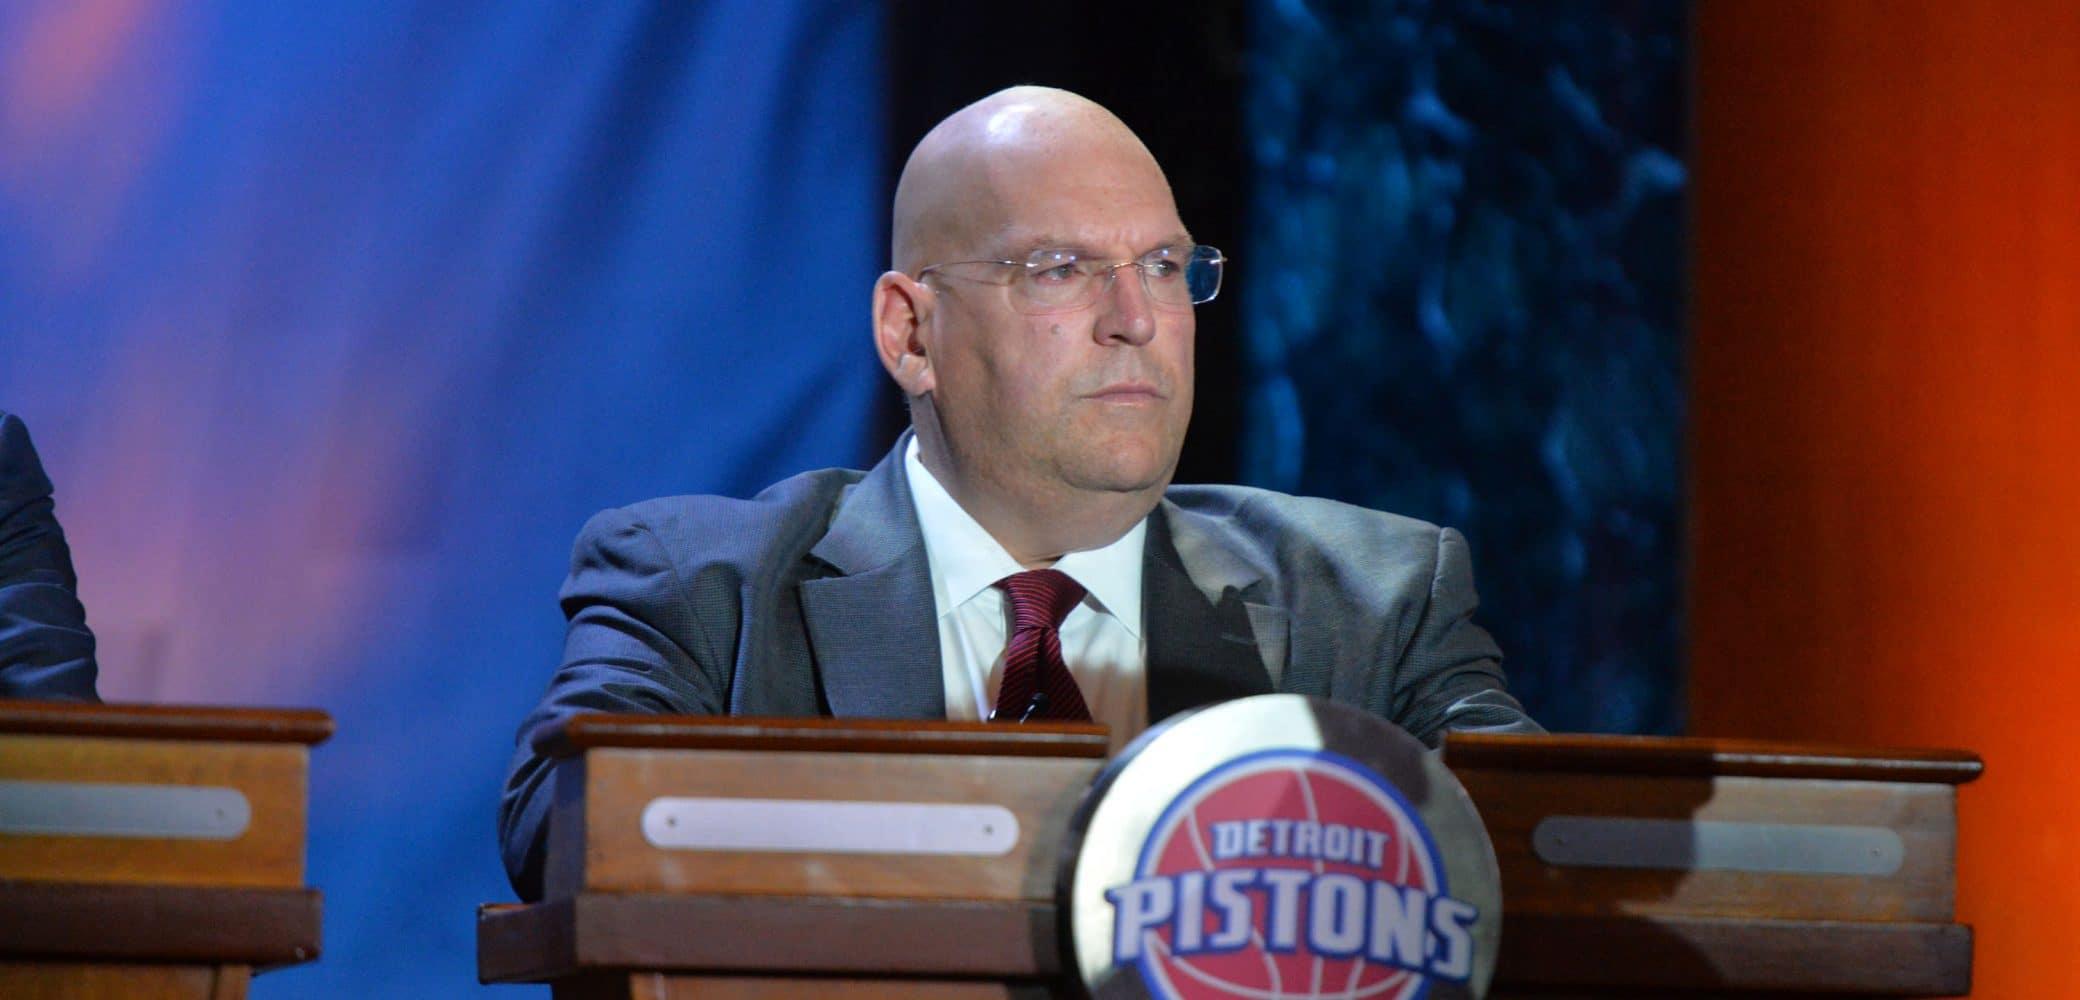 Jeff Bower of the Detroit Pistons